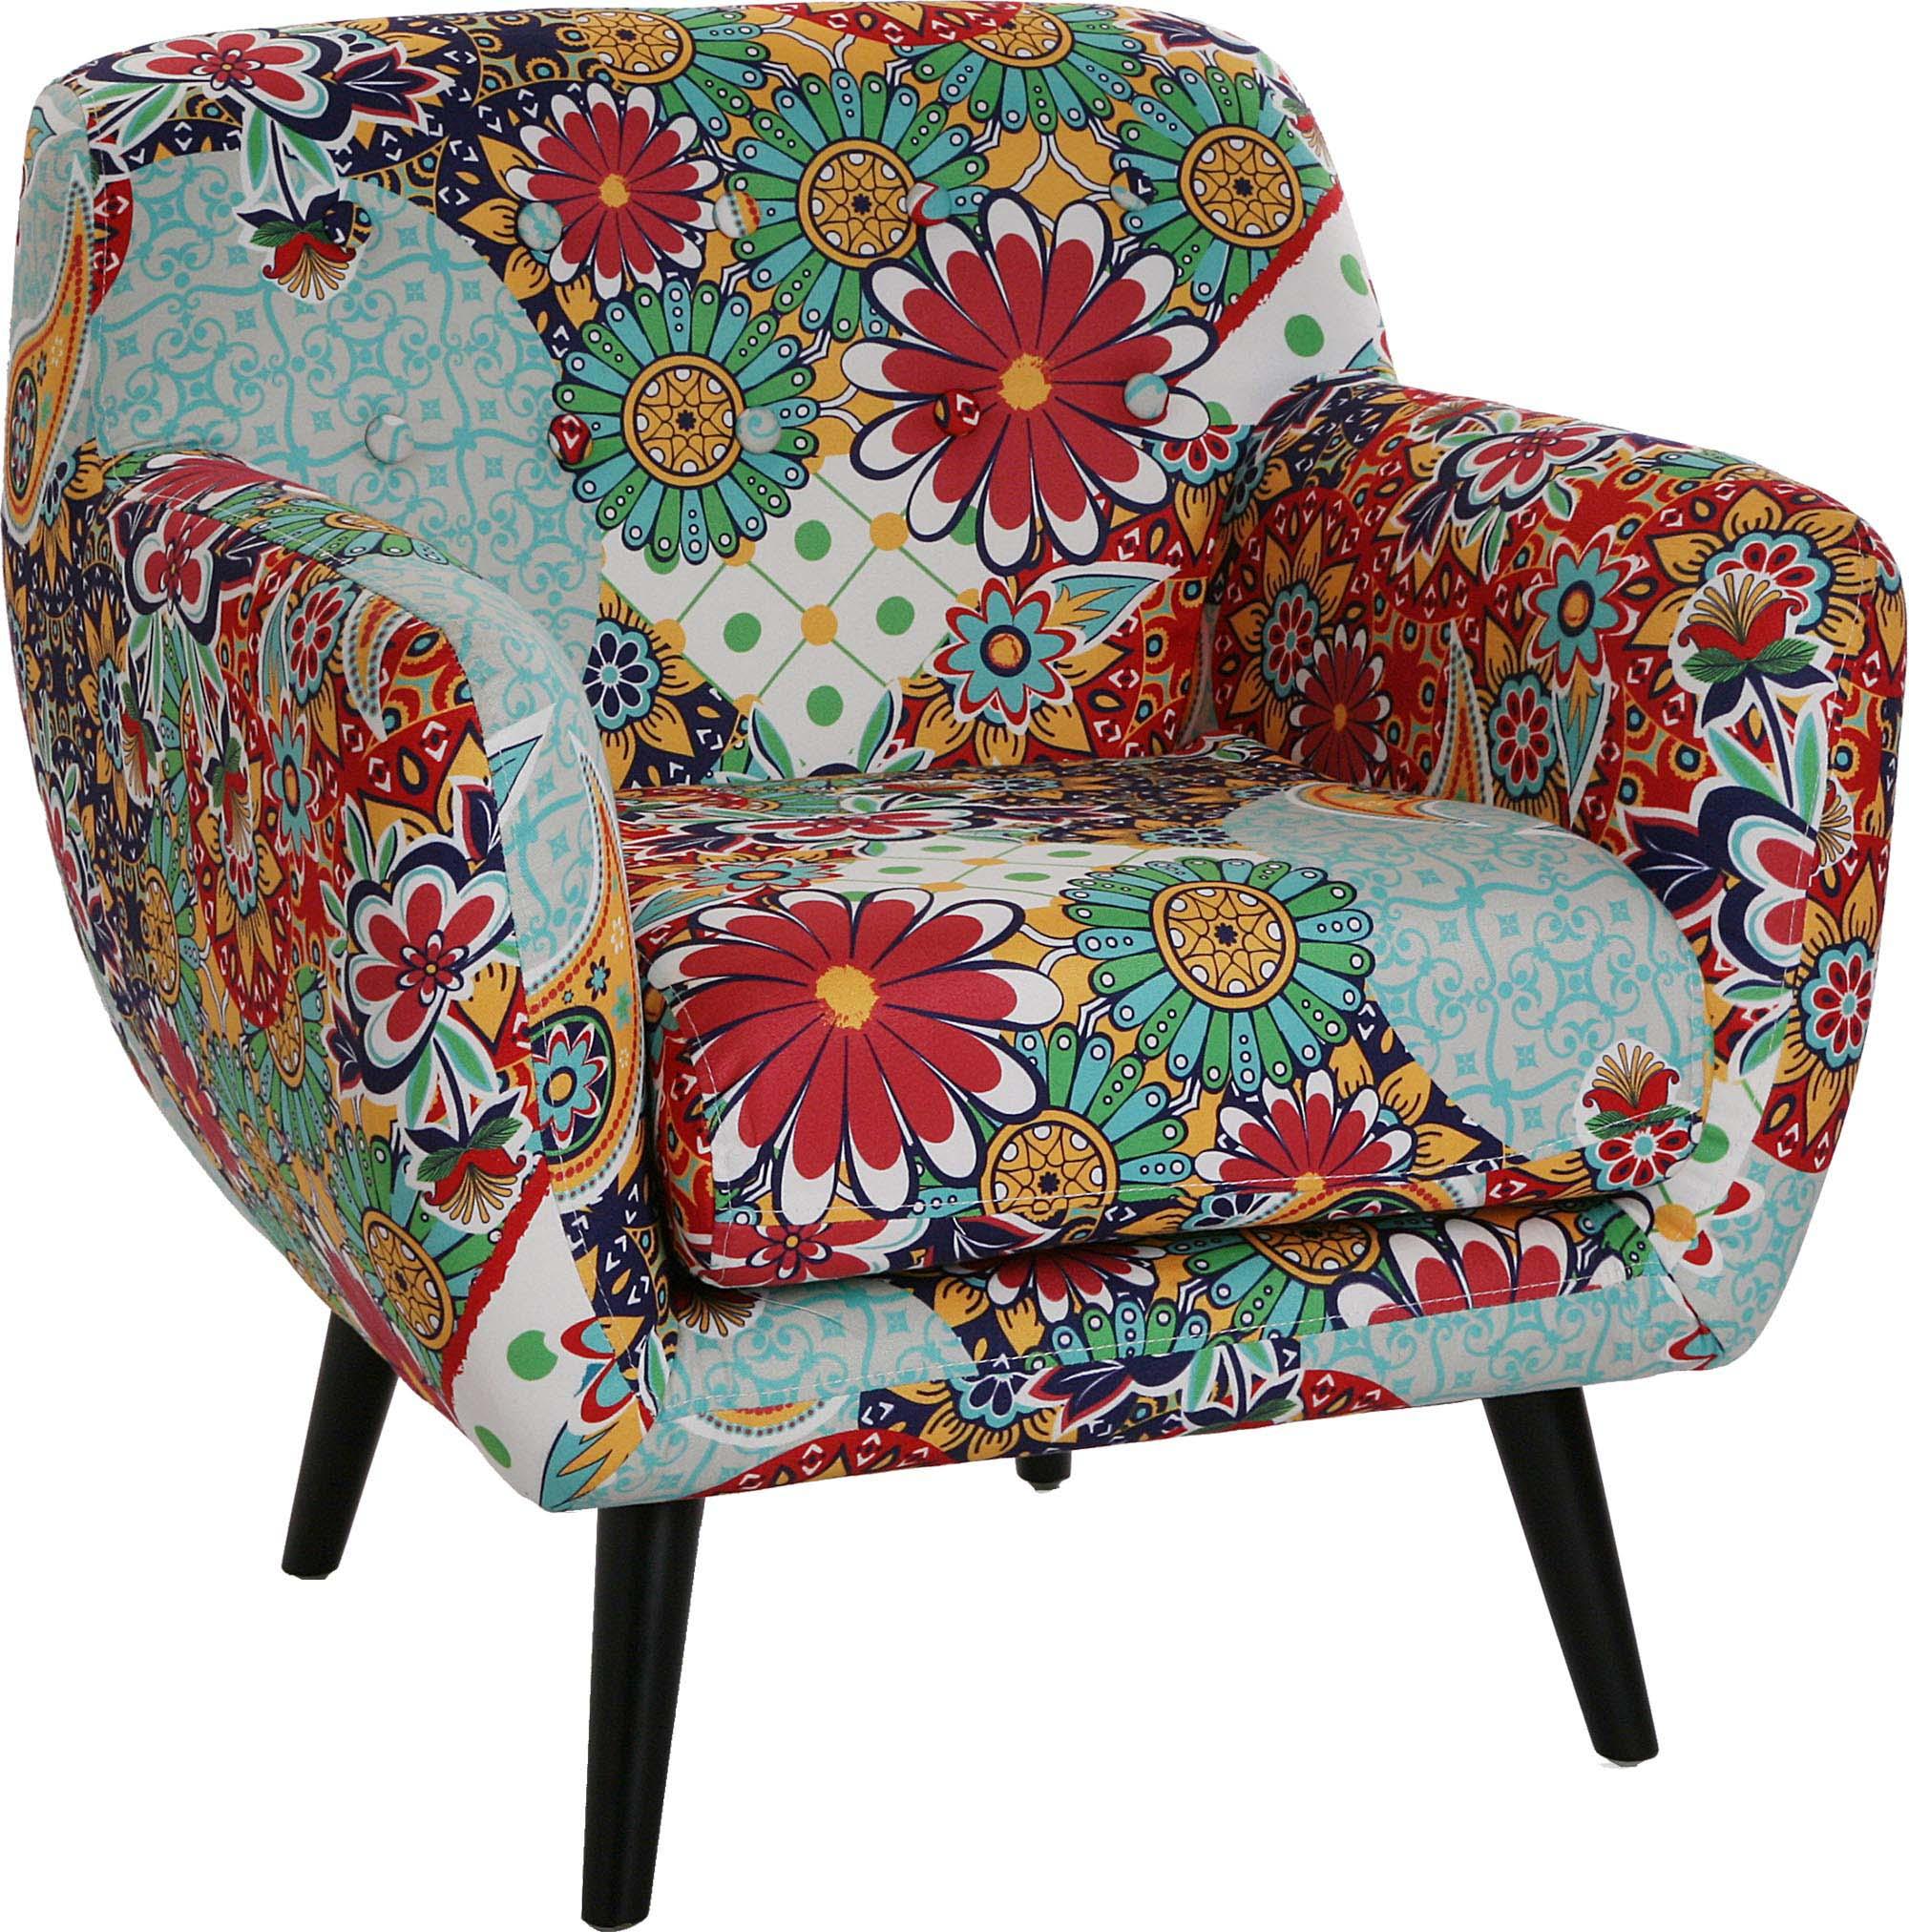 Fauteuil lounge fleuri Giardino